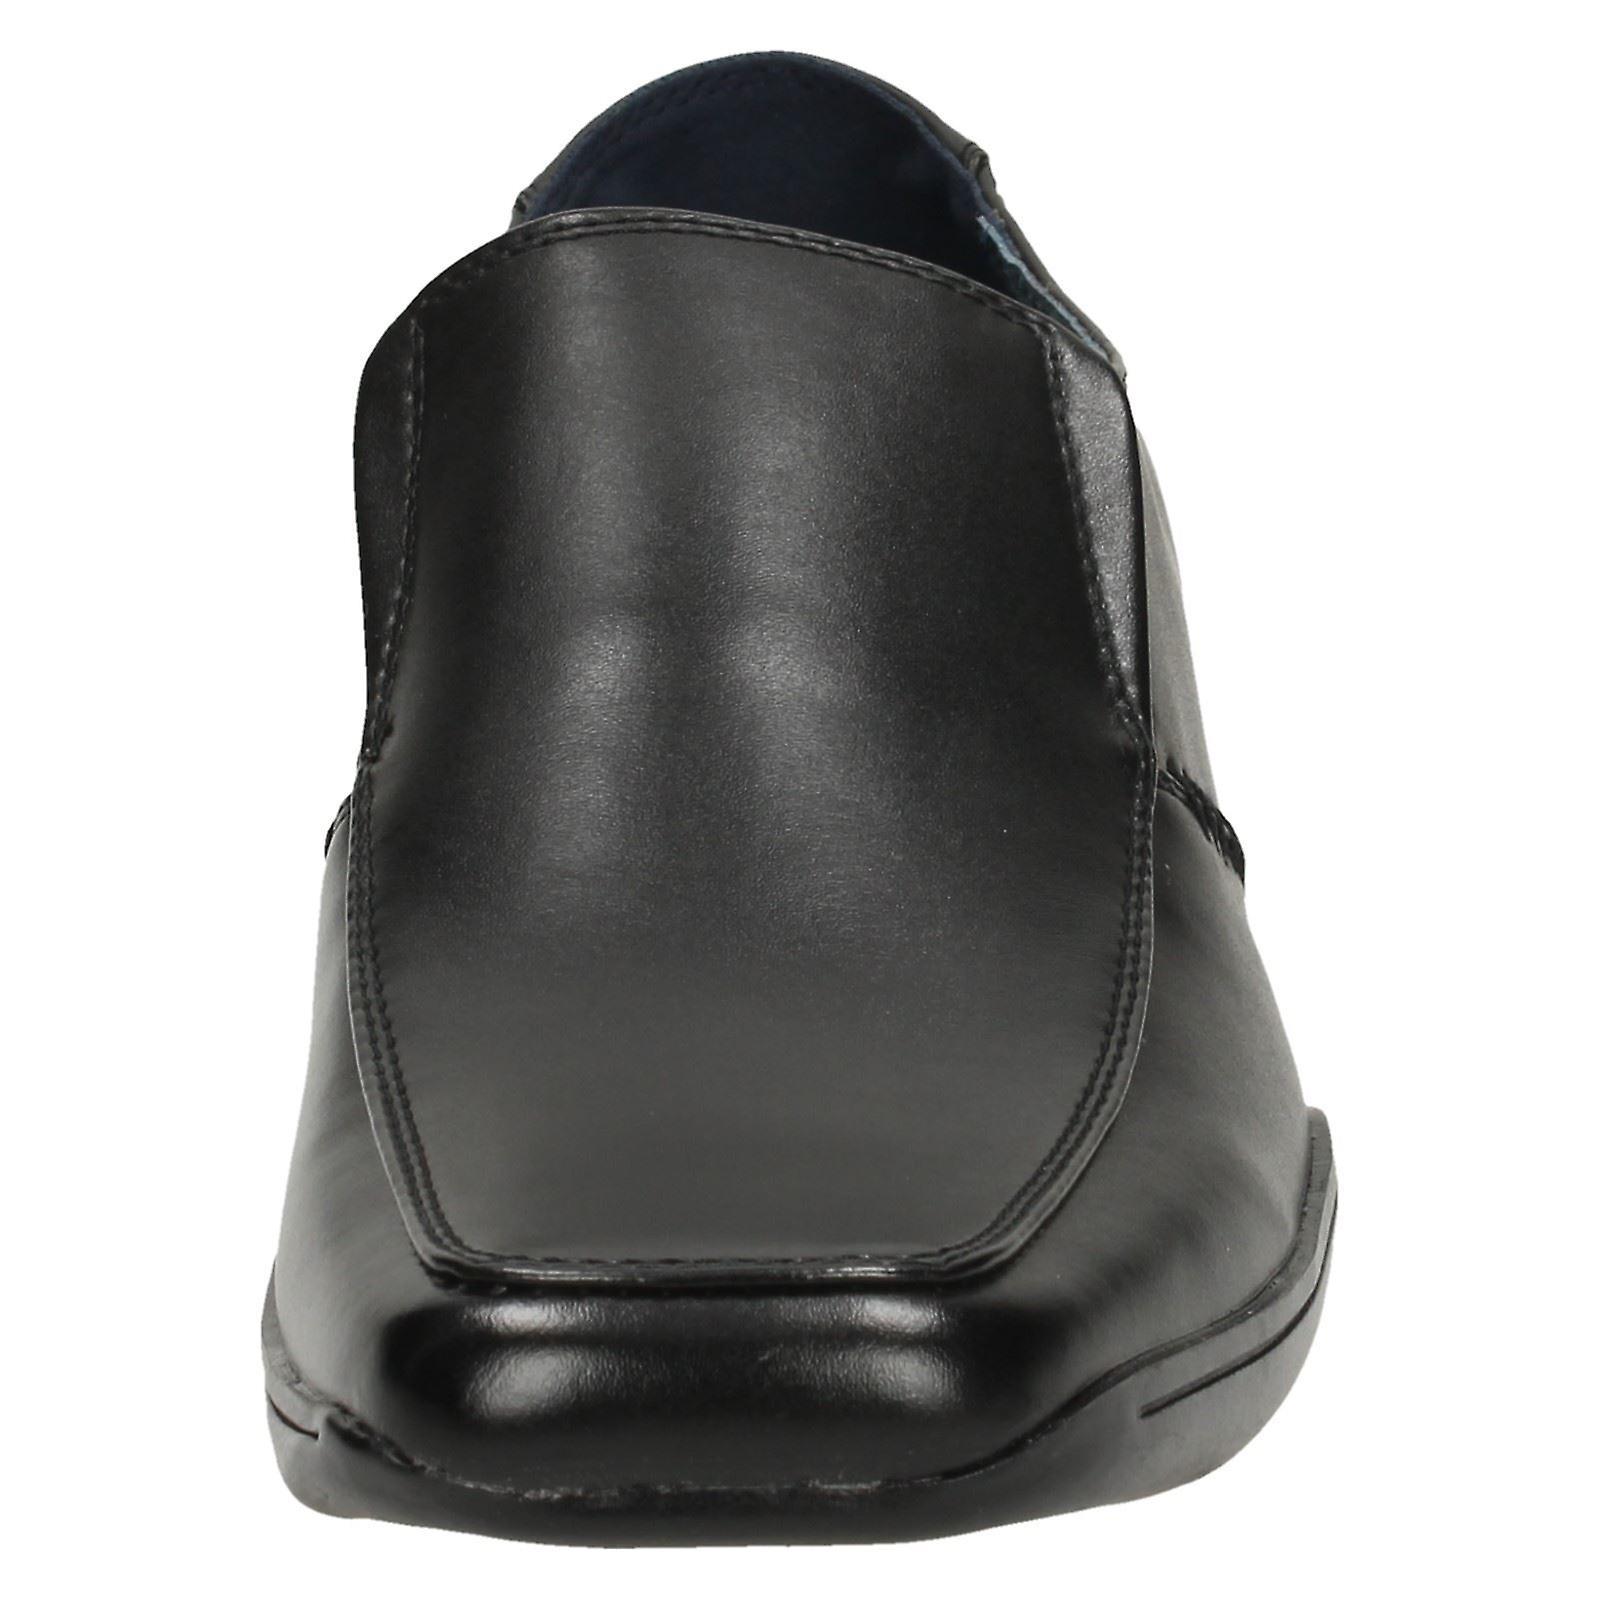 Mens Low Heel Formal Formal Heel Shoes A1043 f7bc81